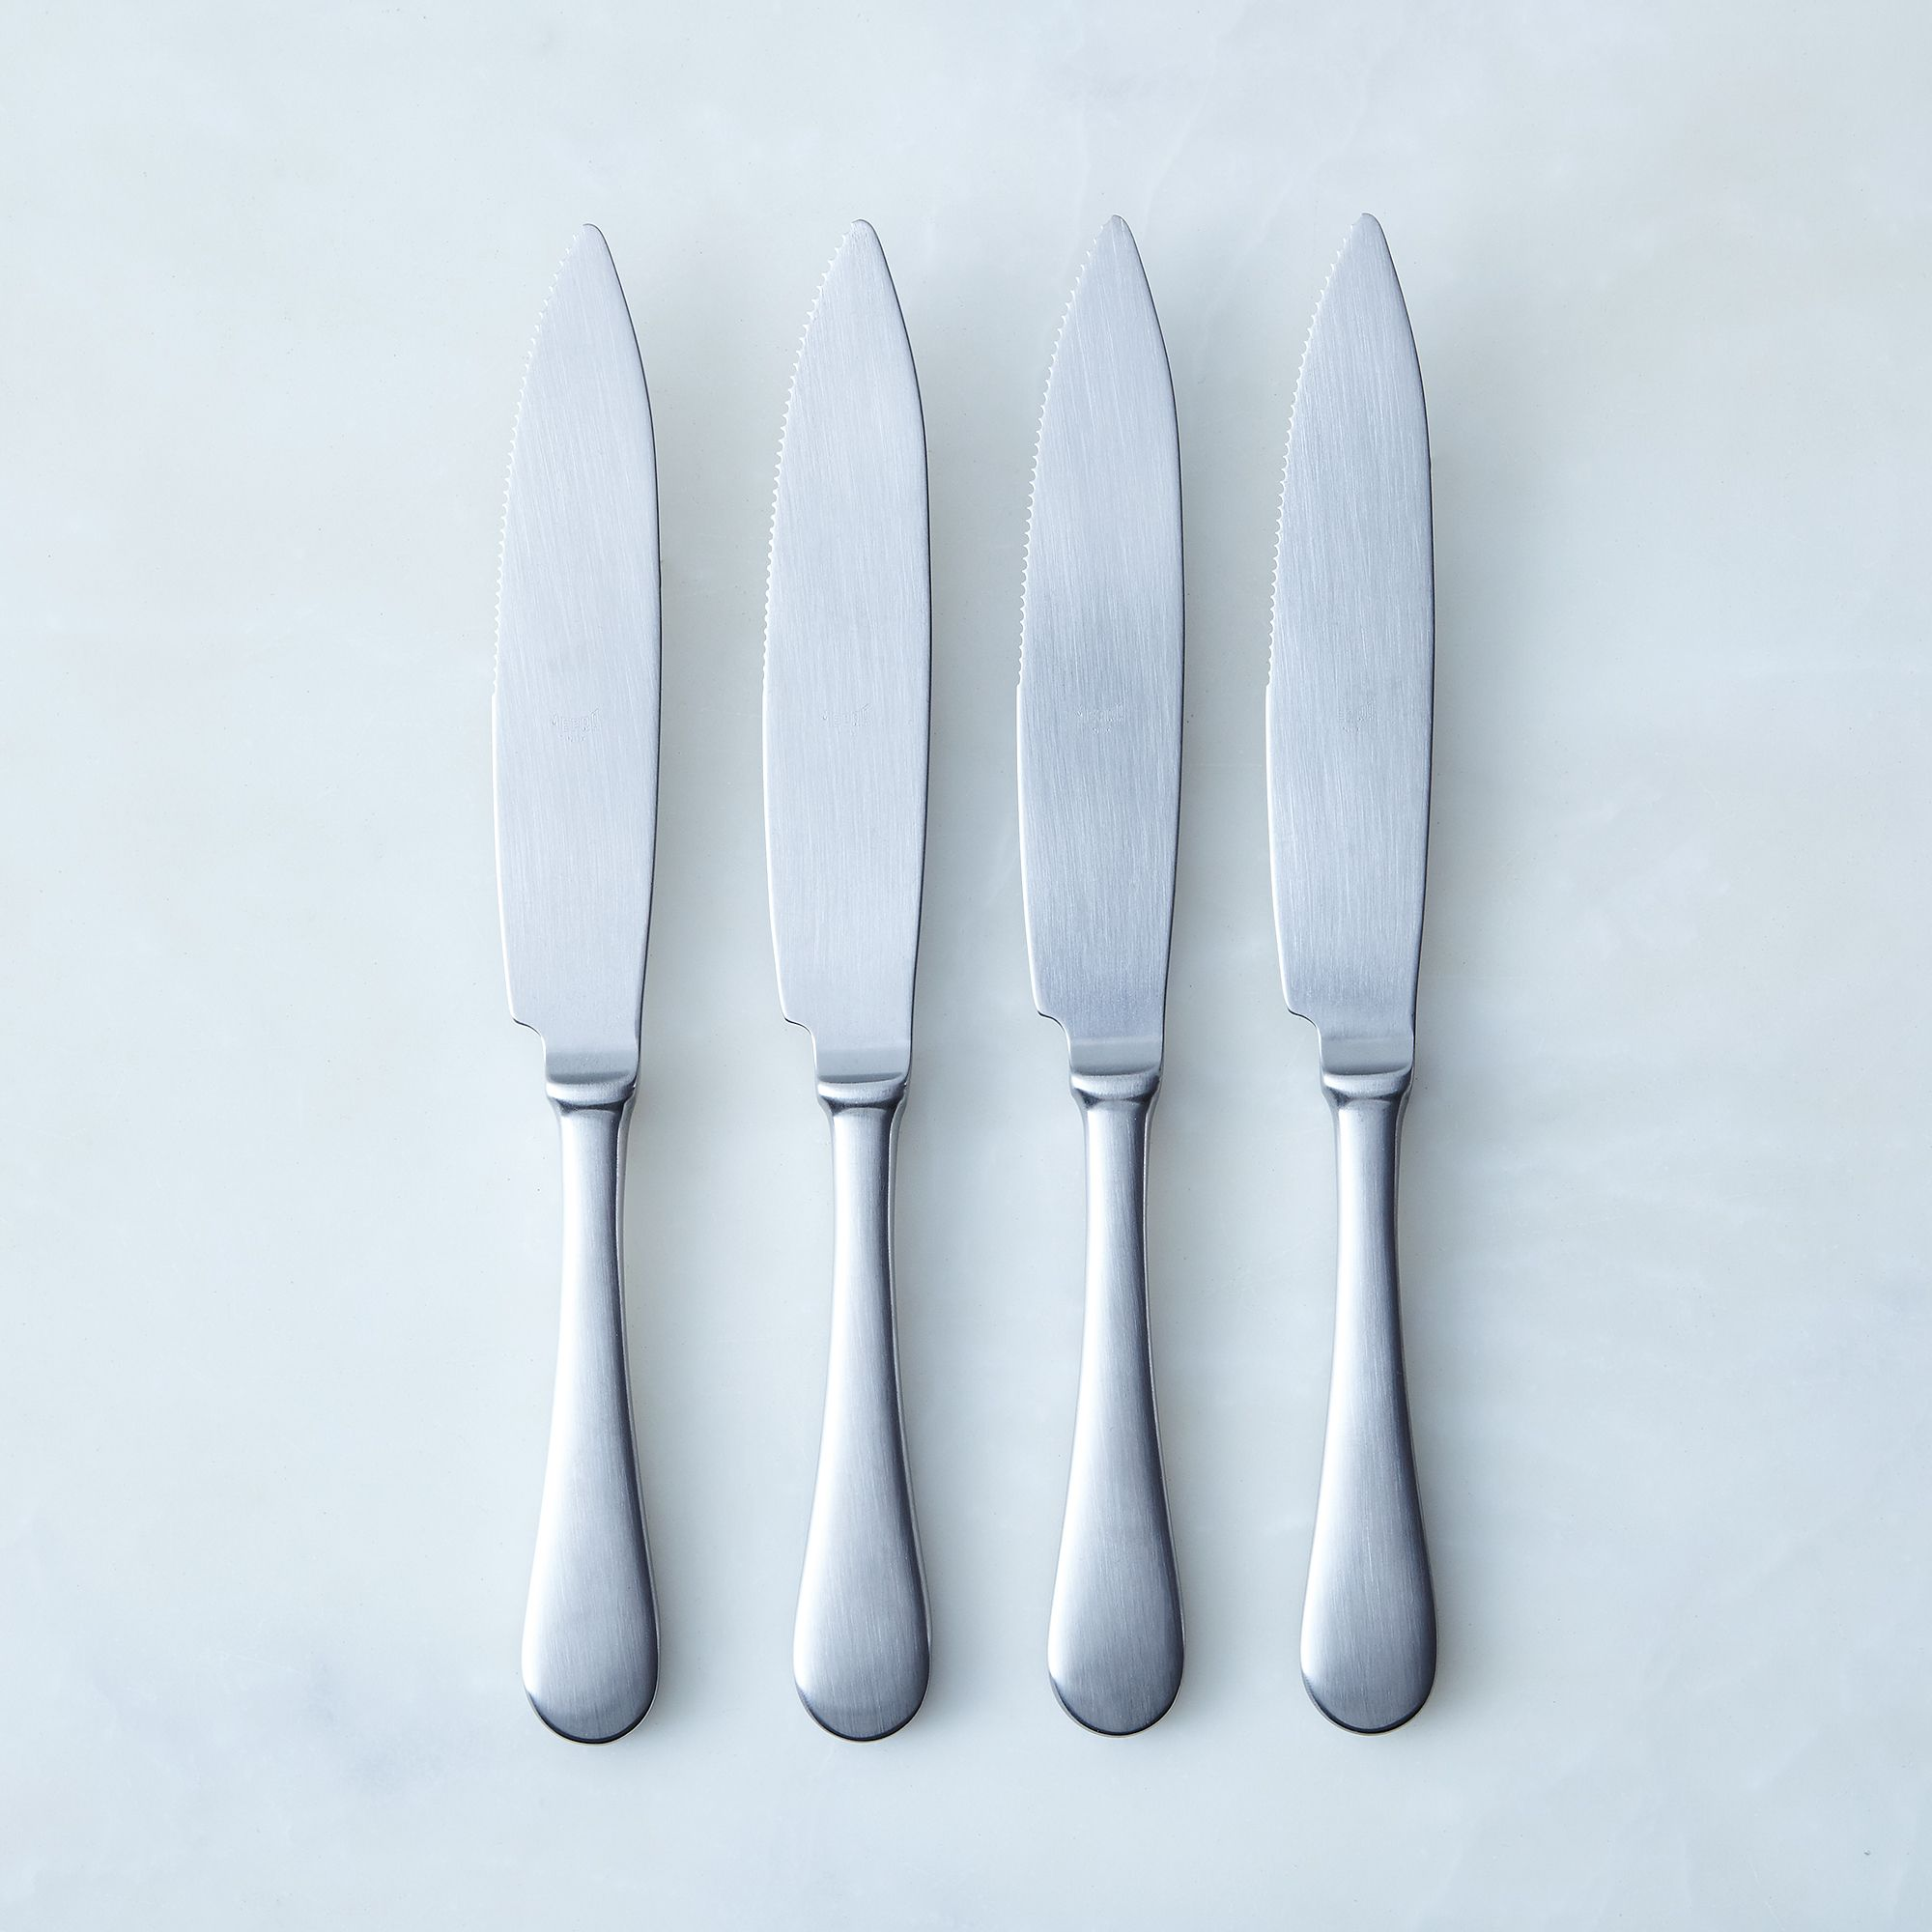 Italian Steak Knives (set Of 4) Stainless Steel Brushed